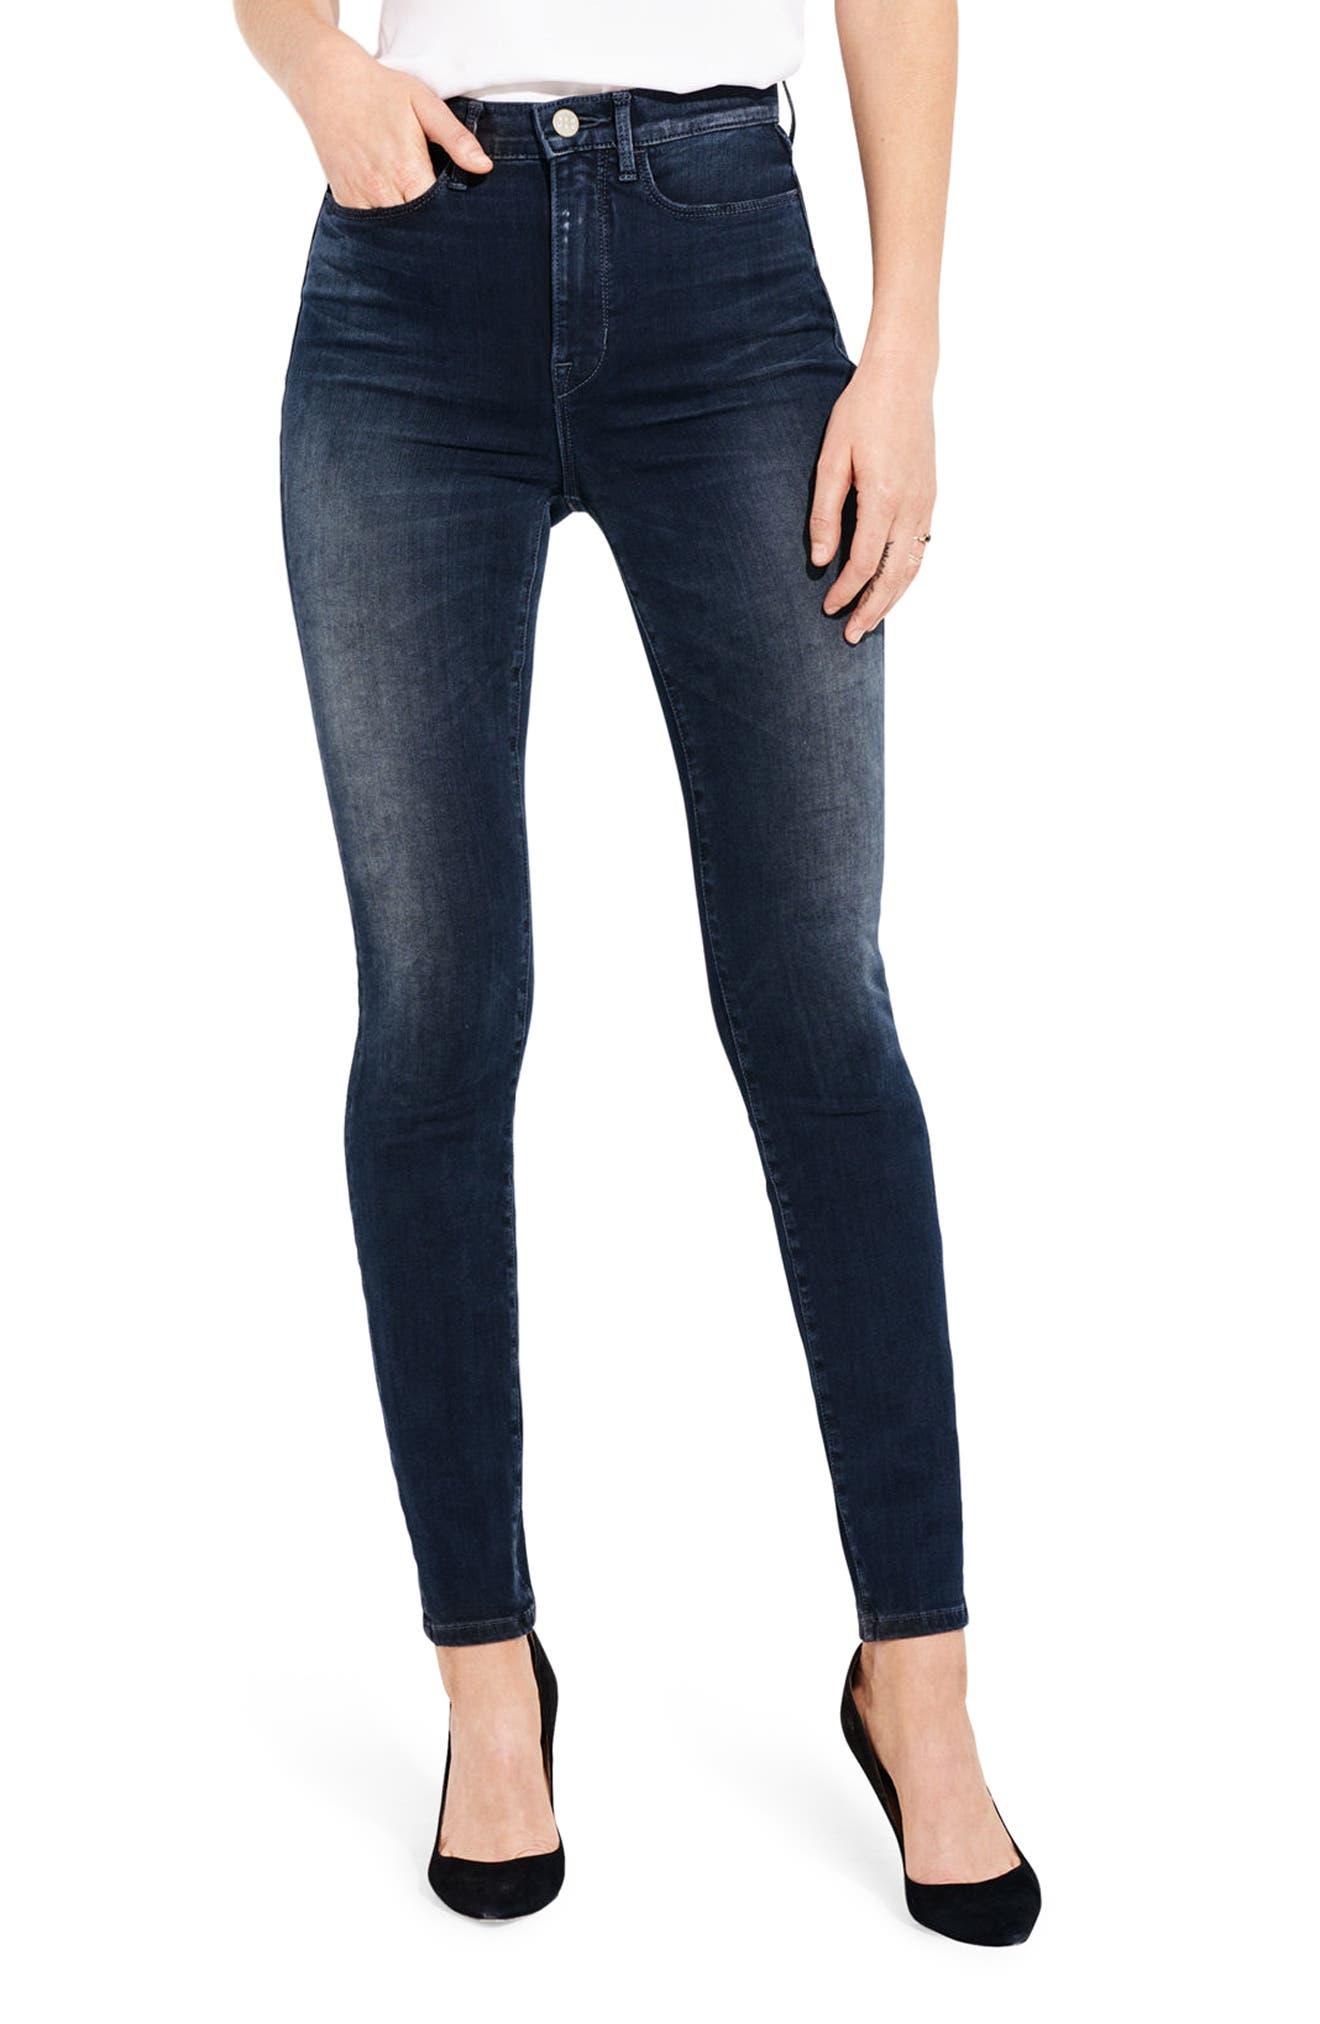 AYR The Riser High Waist Skinny Jeans